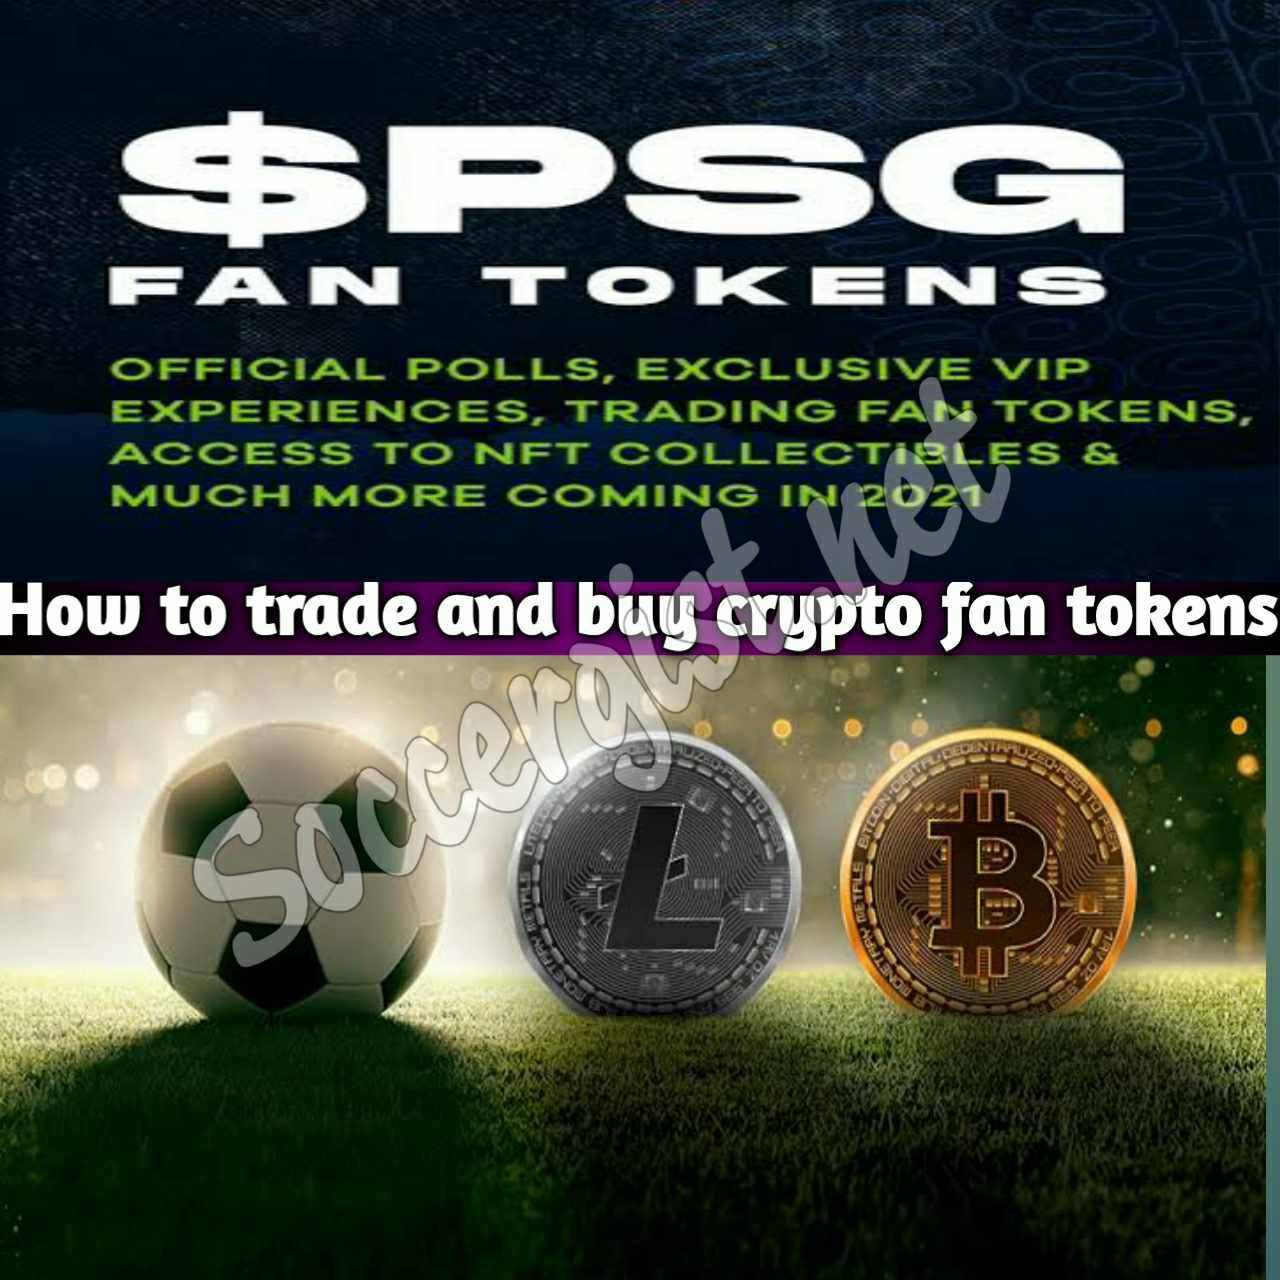 trade-buy-crypto-fans-token-psg-football-club